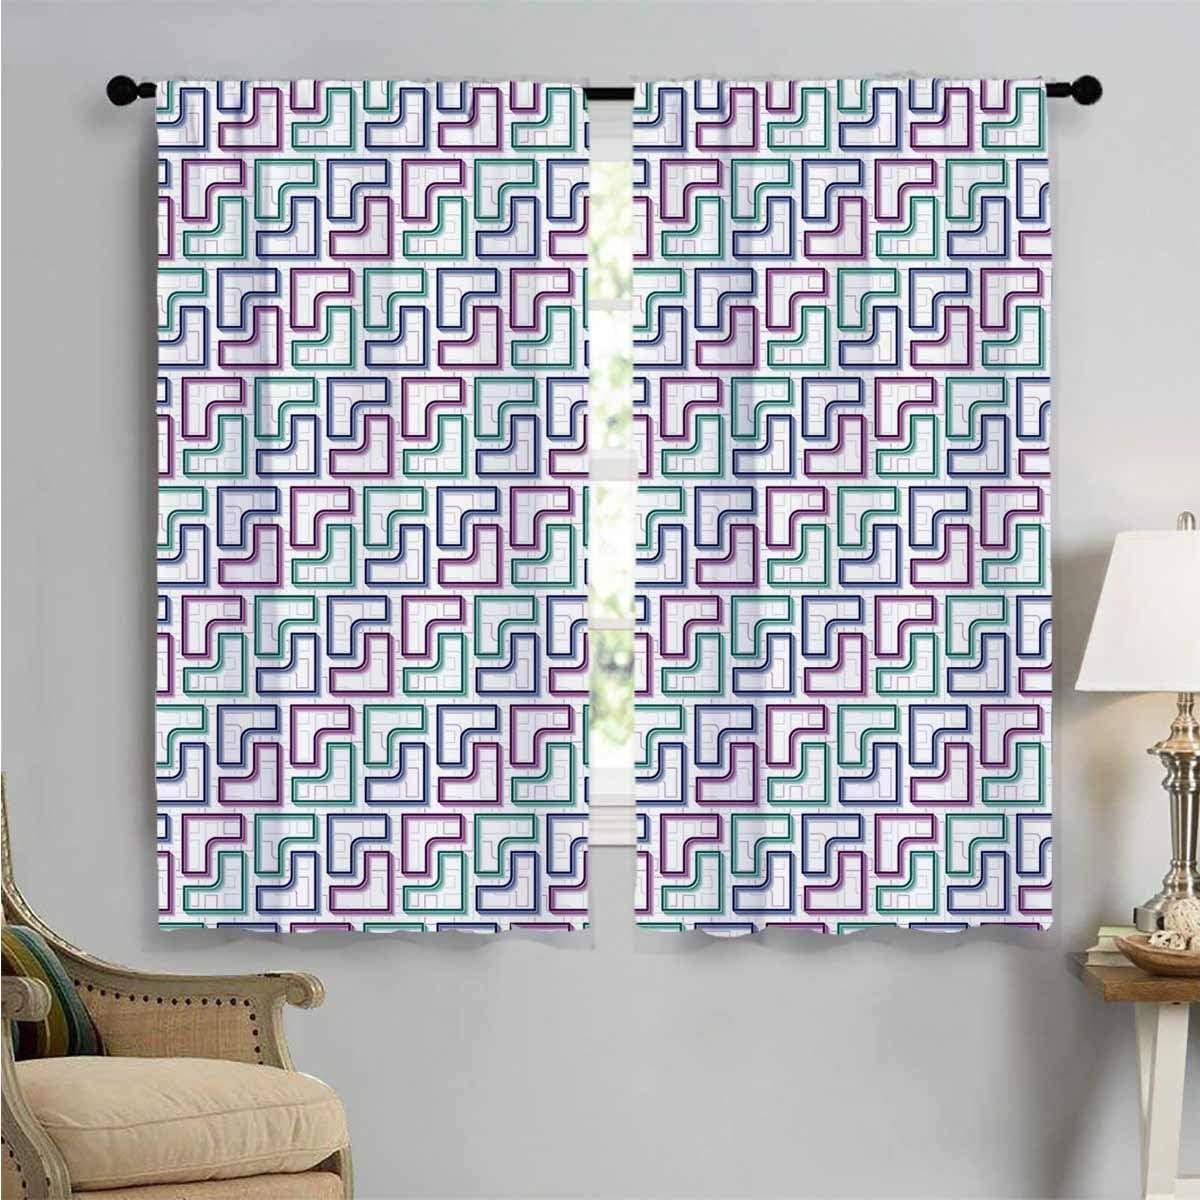 Bedroom Curtains Trippy Maze Max 77% OFF Genuine Tiles Kids Artwork Panels 2 Room